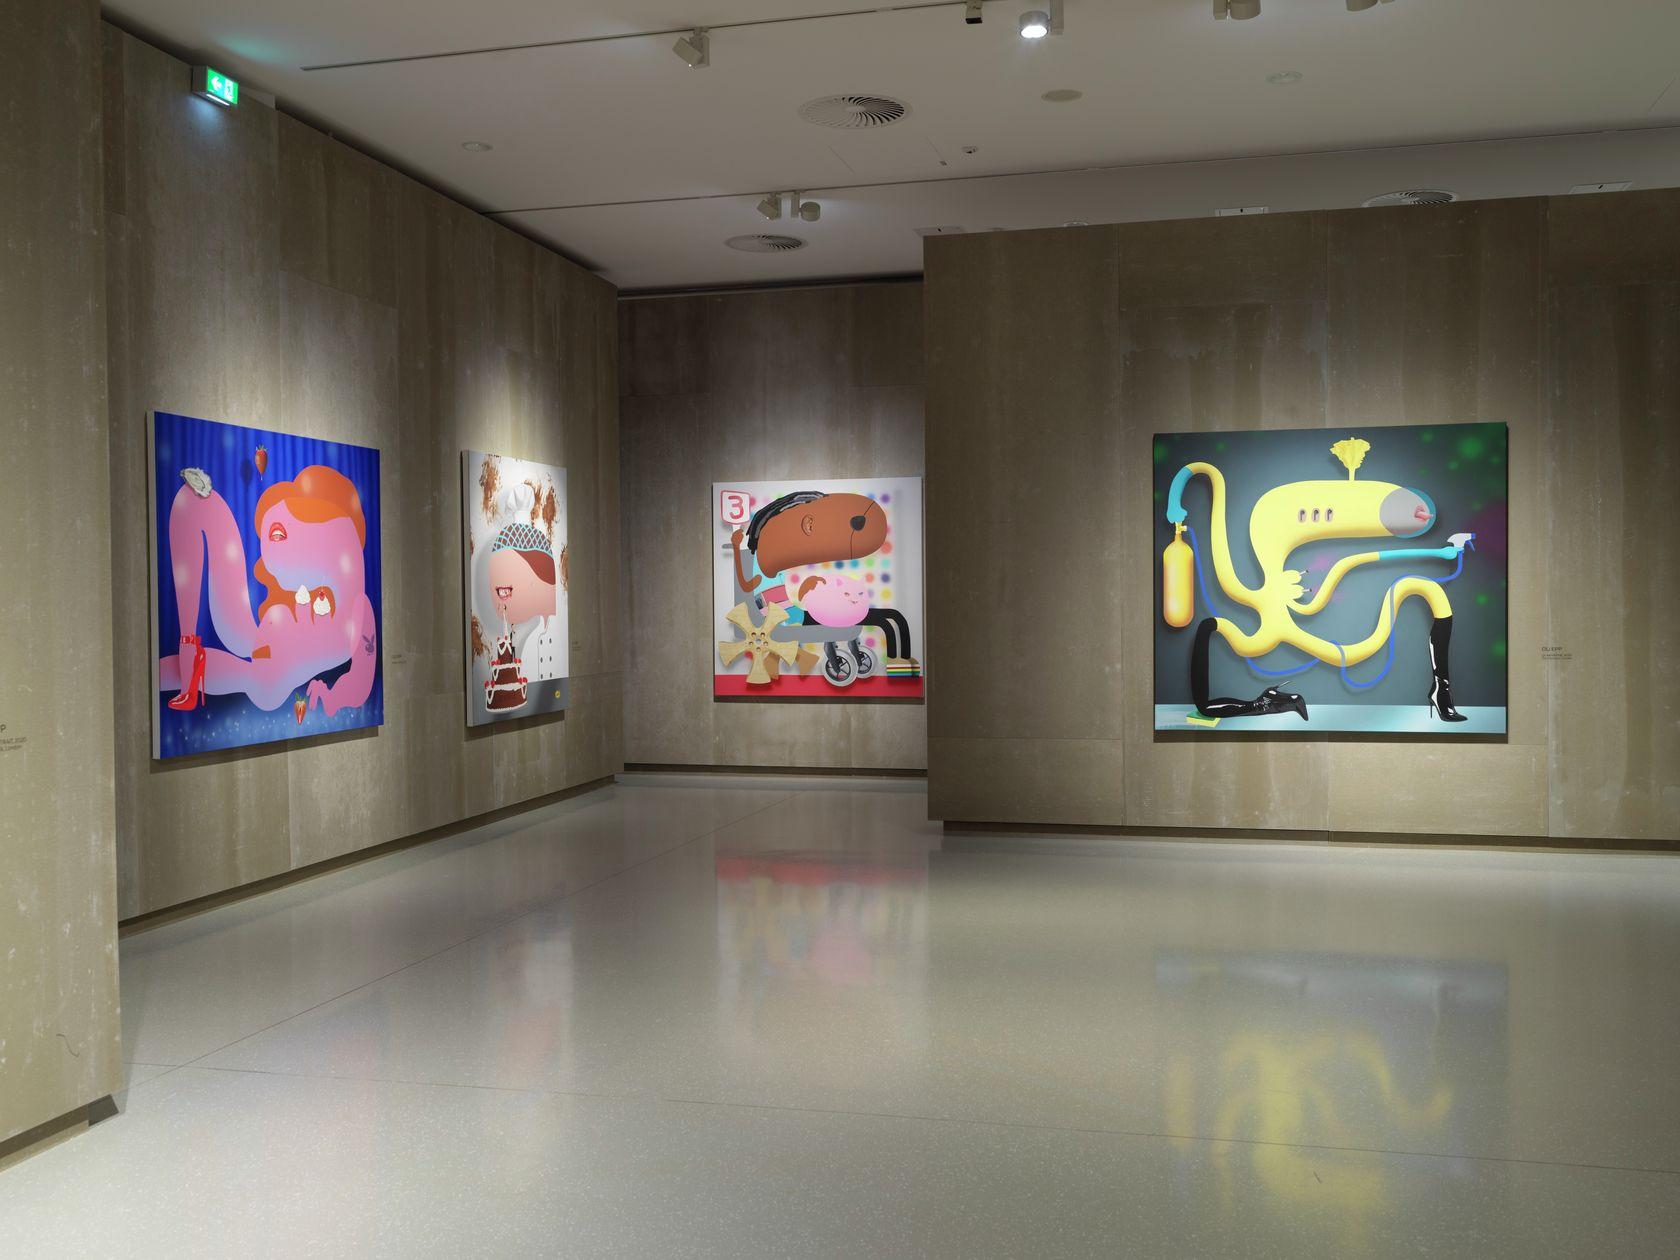 Oli Epp Friends and Friends of Friends Schlossmuseum, Linz (AT) 30 septembre 2020 — 6 janvier 2021